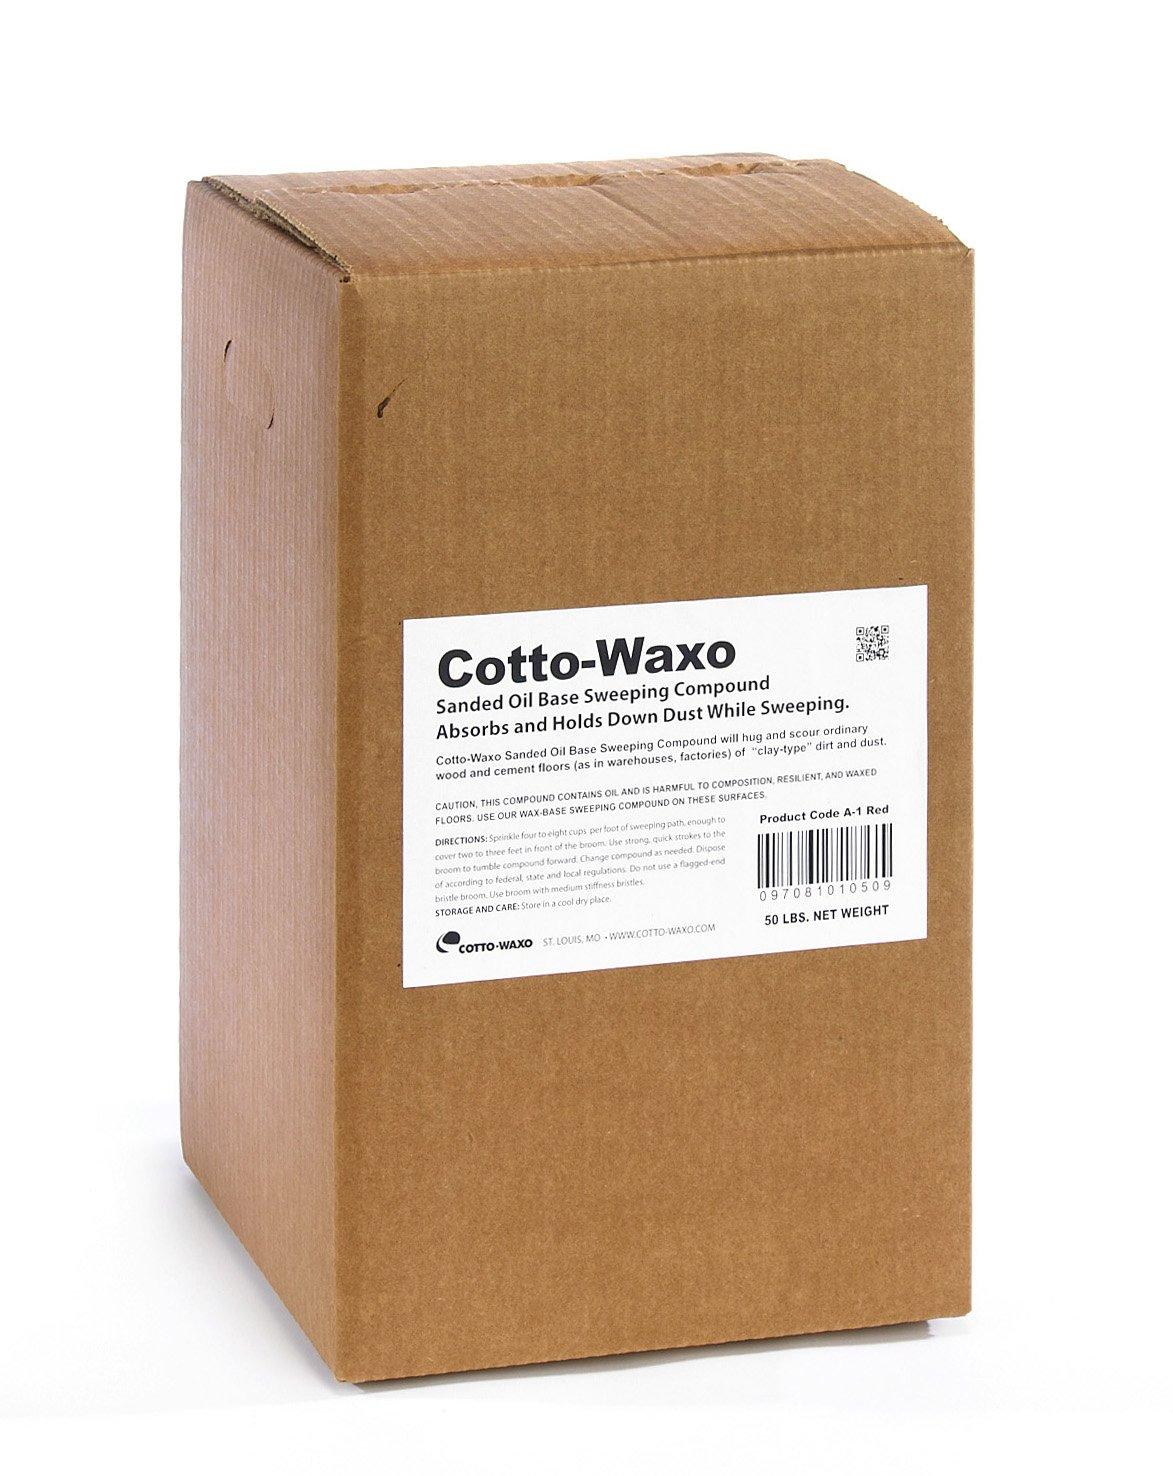 Amazon.com: Cotto Waxo A 1 Sanded Oil Base Sweeping Compound, 50 Lbs Box:  Industrial U0026 Scientific